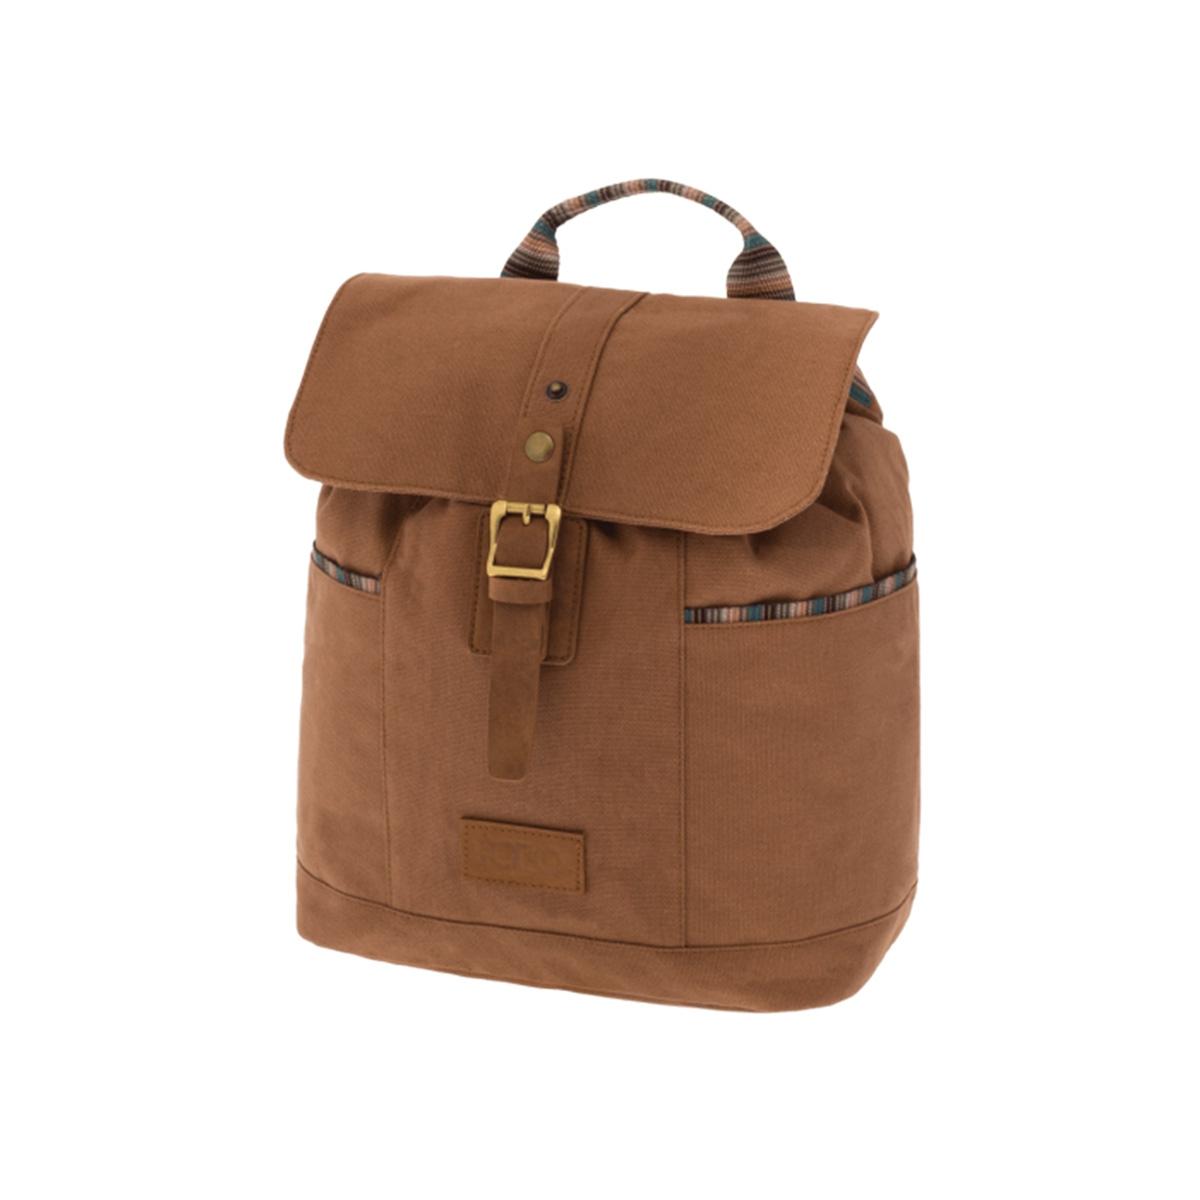 6cc8b6802972 Σακίδιο Πλάτης Polo Backpack Canvas Lady 9-07-152-36 Καφέ Προσφορά ...